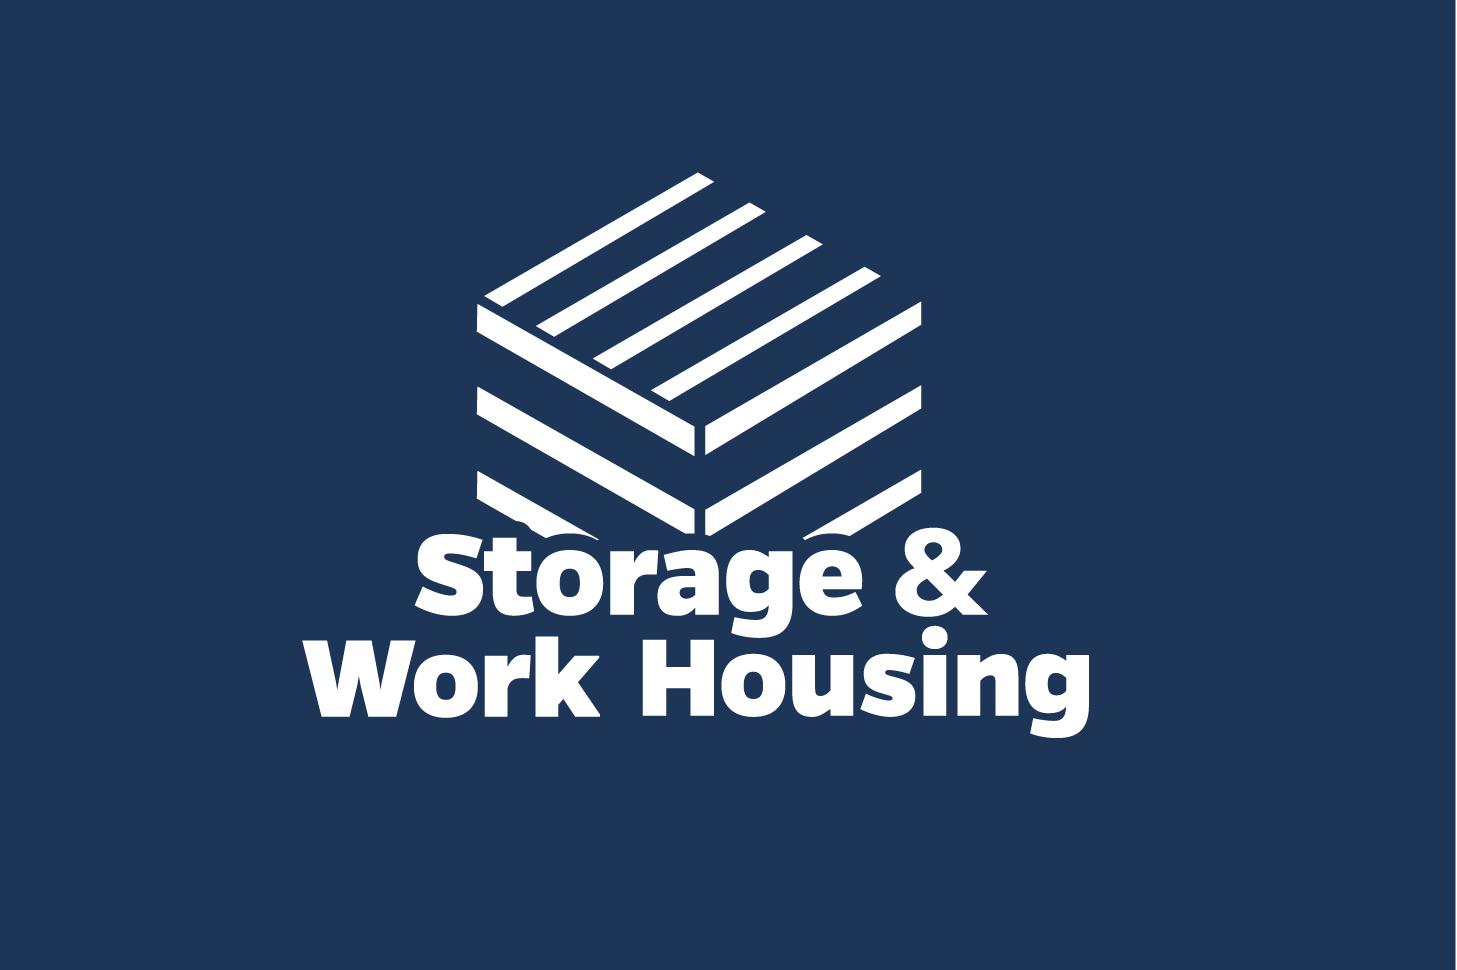 AF Storage & Work Housing DO final_Mesa de trabajo 1 copia 2.jpg